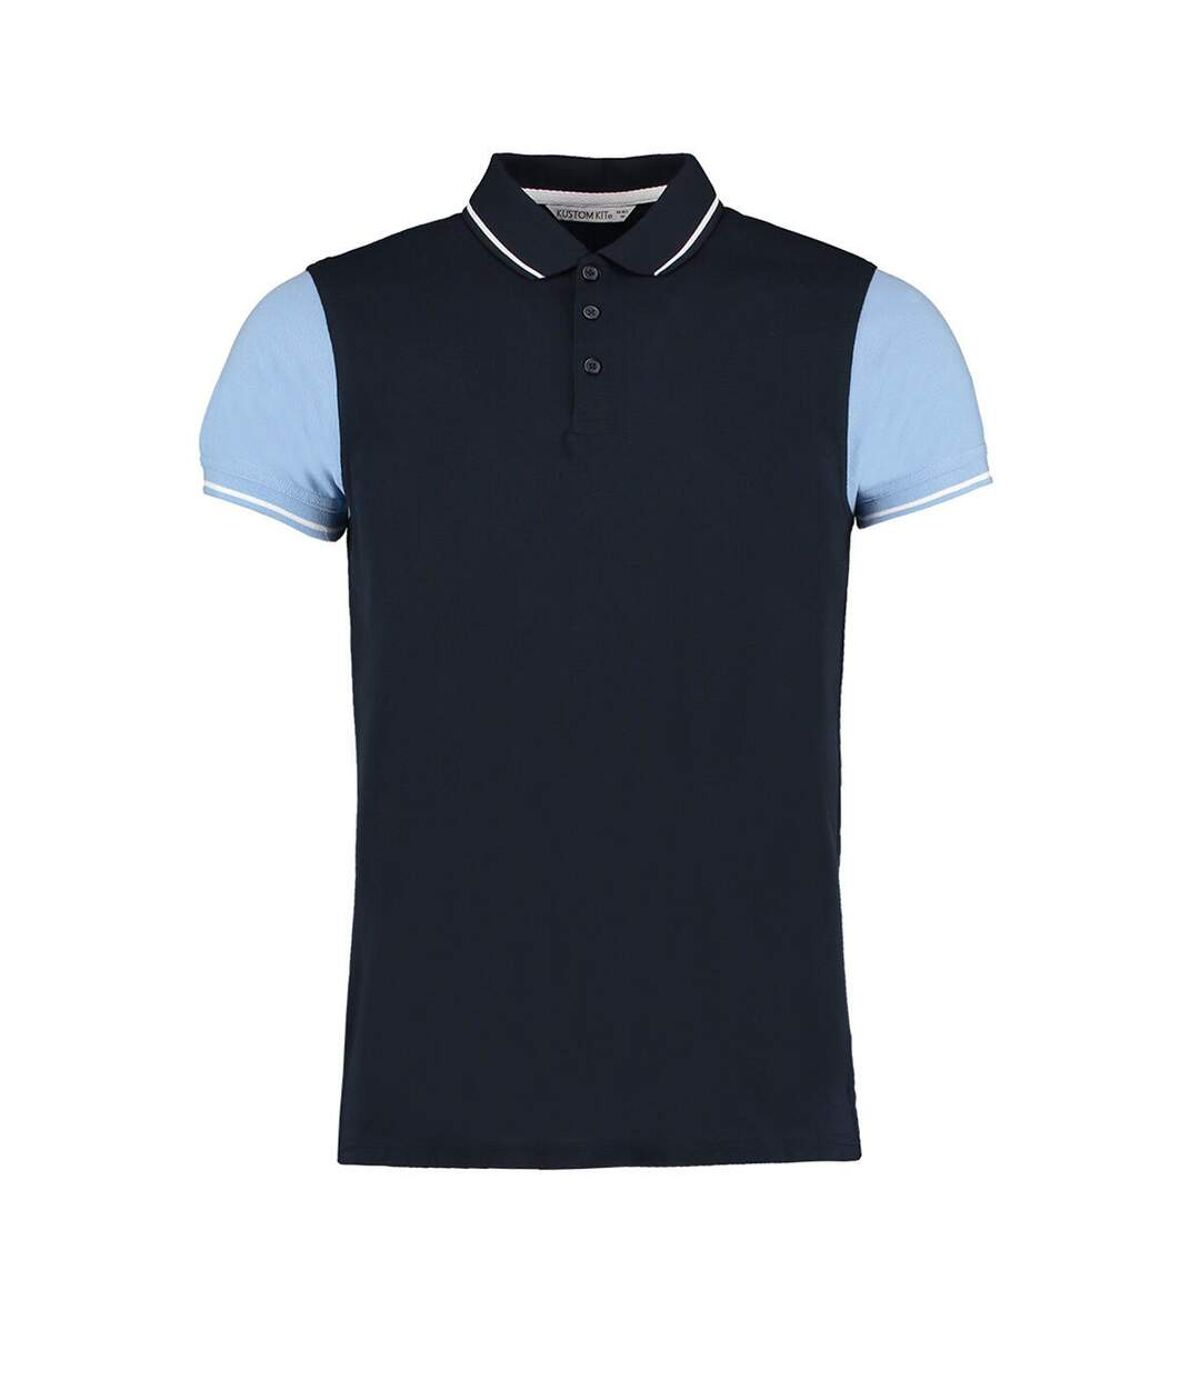 Kustom Kit Mens Two Tone Contrast Tipped Polo Shirt (Navy/Light Blue/White) - UTBC3728